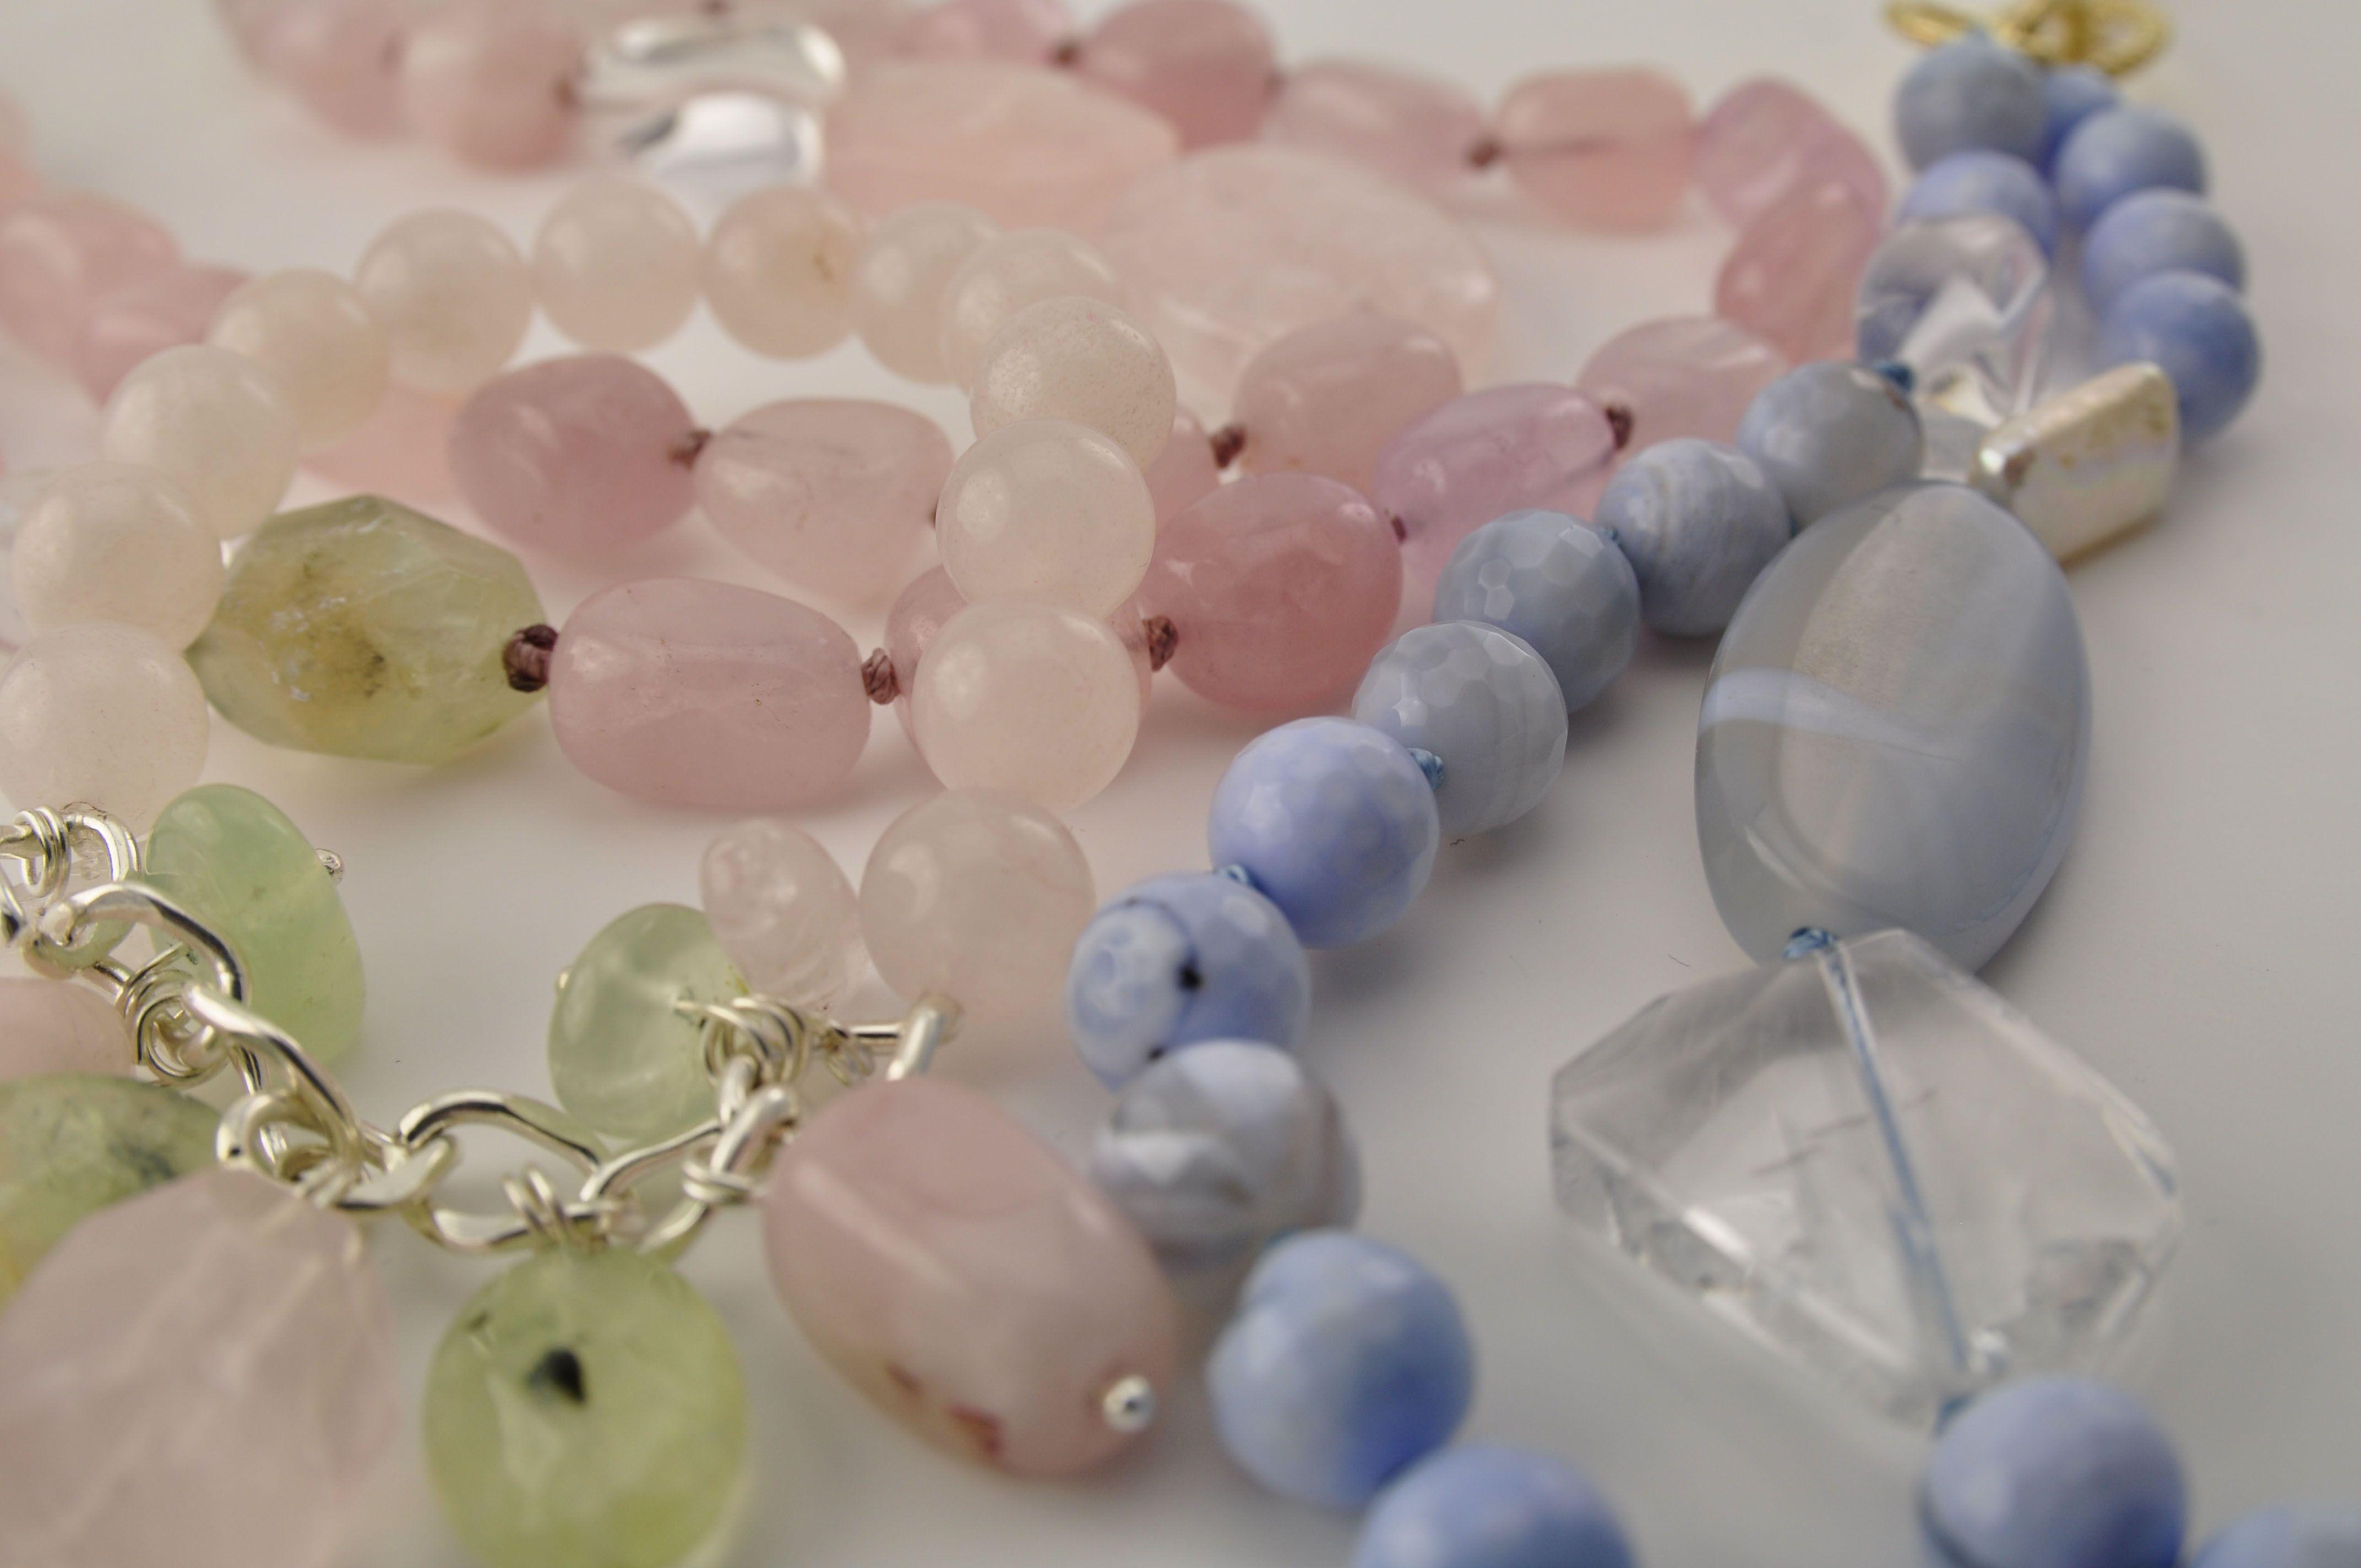 Fantasy stones. Luxenter